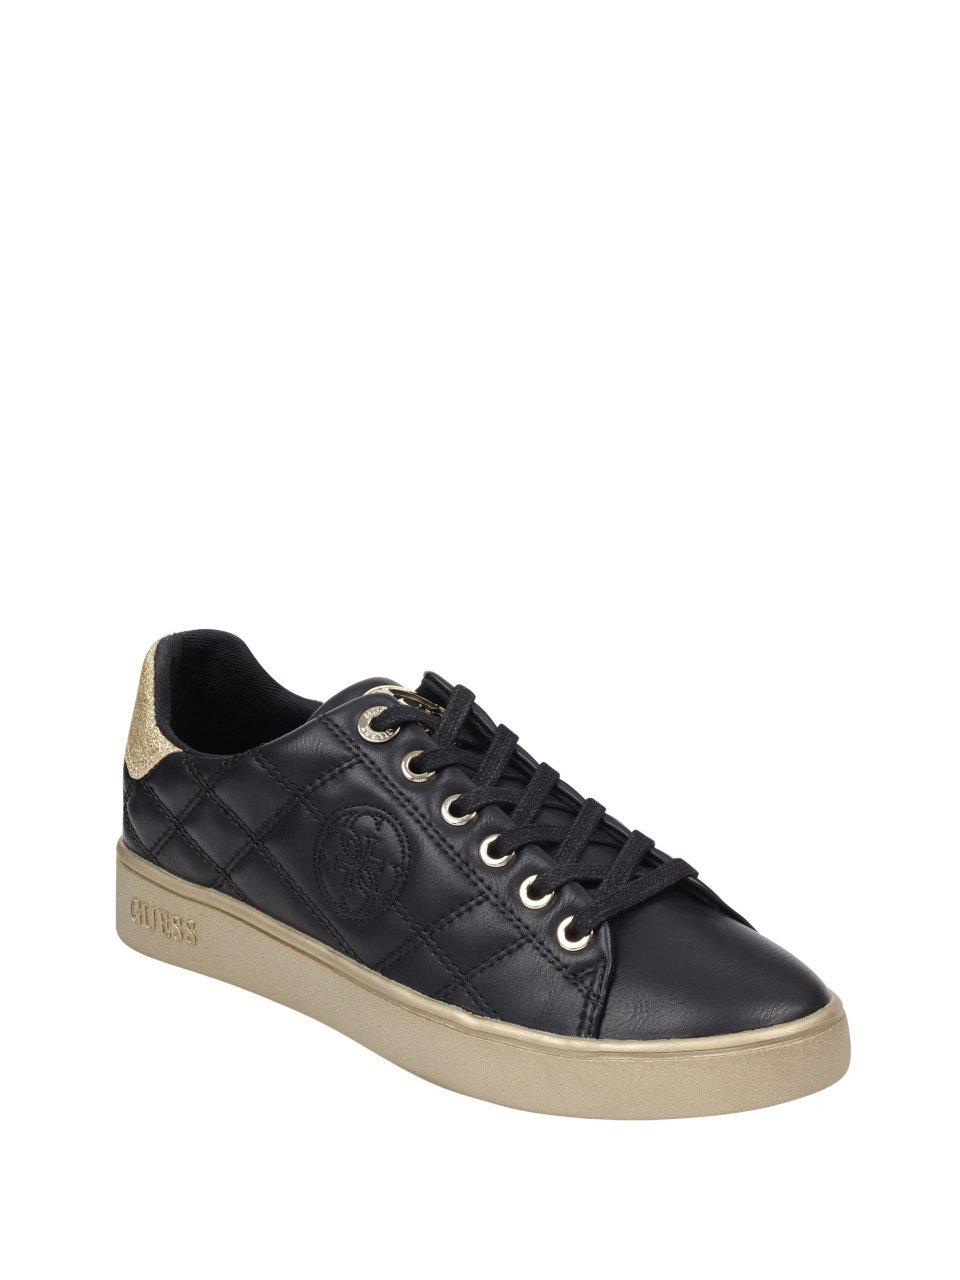 GUESS Women's Brayz Quilted Glitter Sneakers B07DV7158X 8 B(M) US|Black Multi Texture